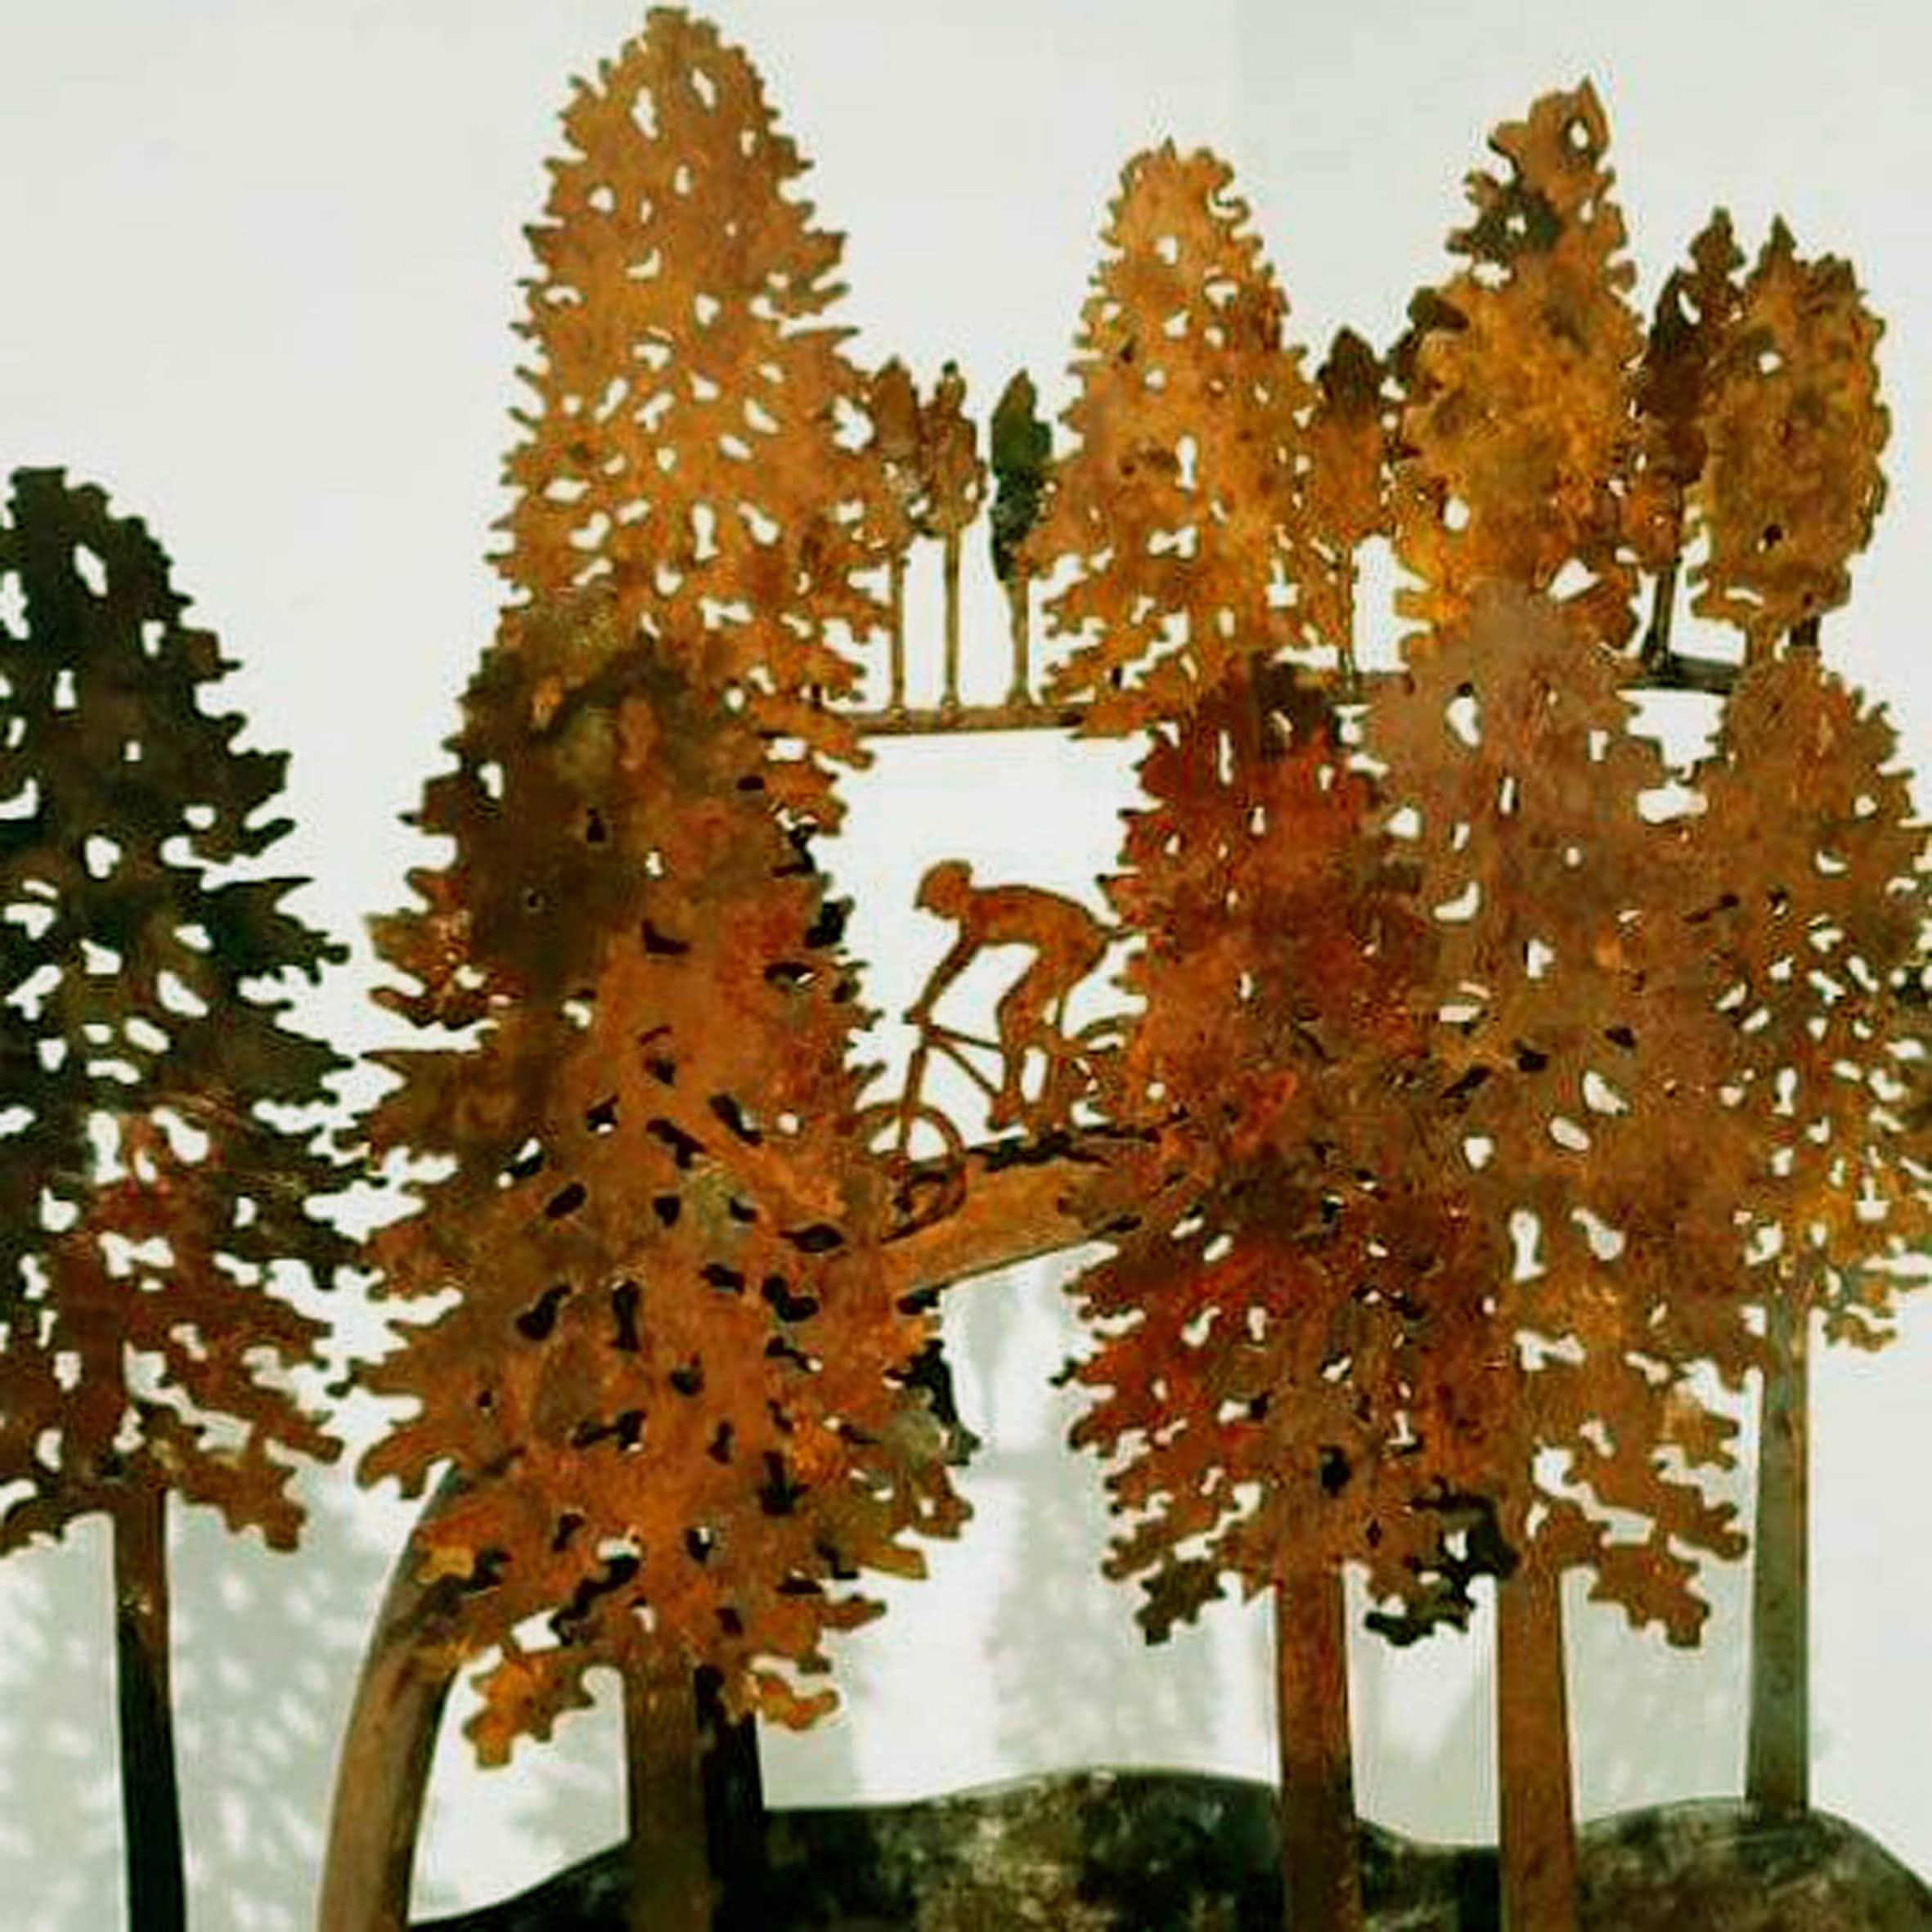 David's piece Singletrack draws on his love of mountain biking